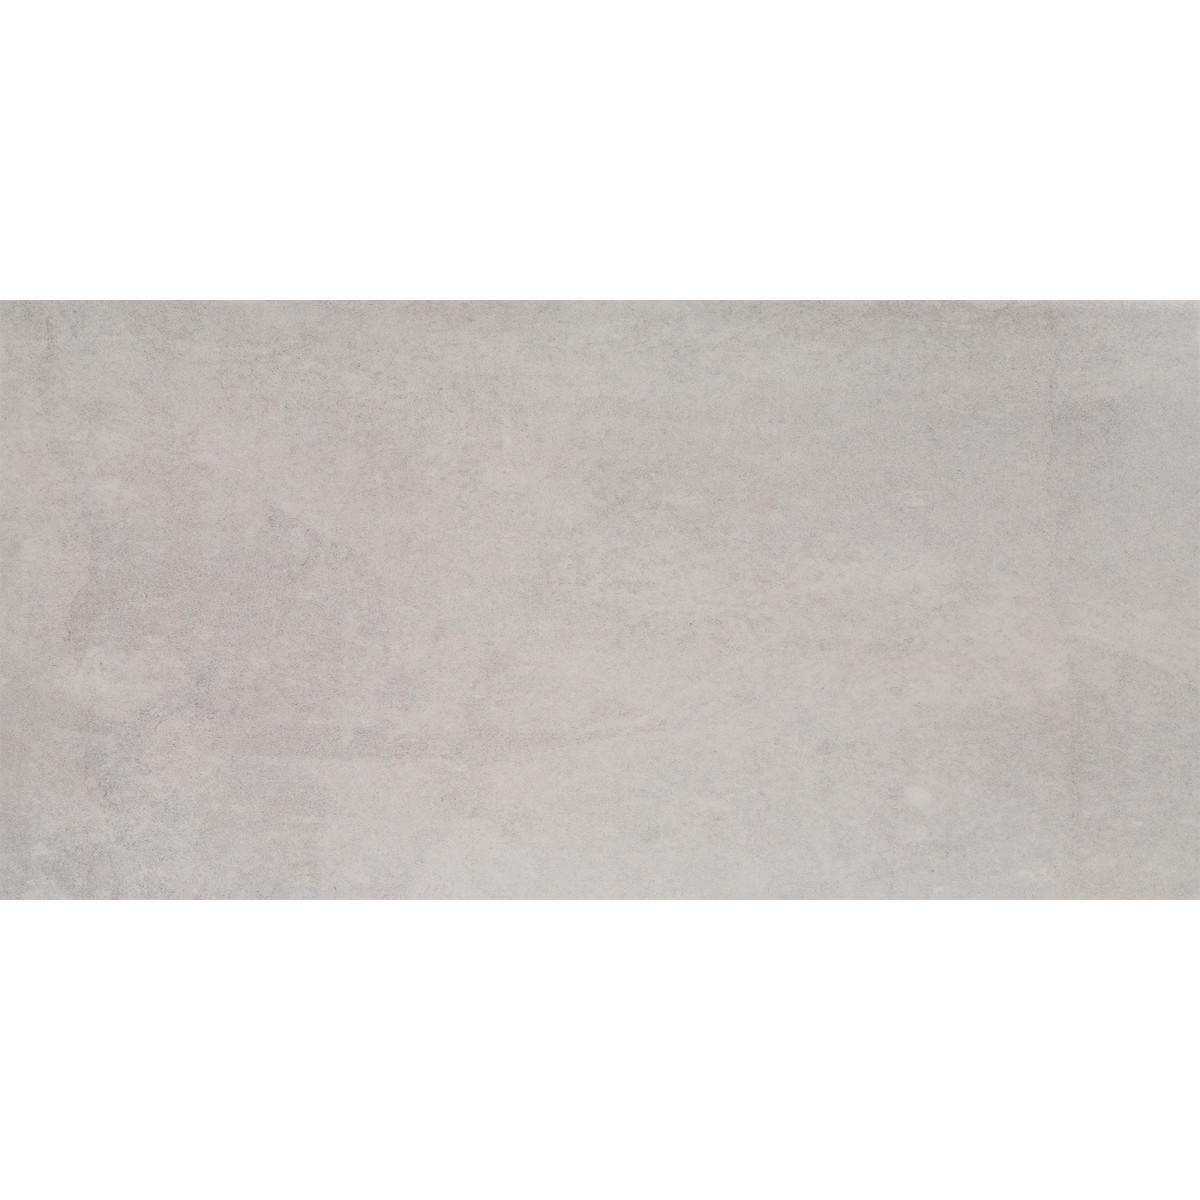 Плитка наcтенная Bastion 20х40 см 1.2 м2 цвет серый